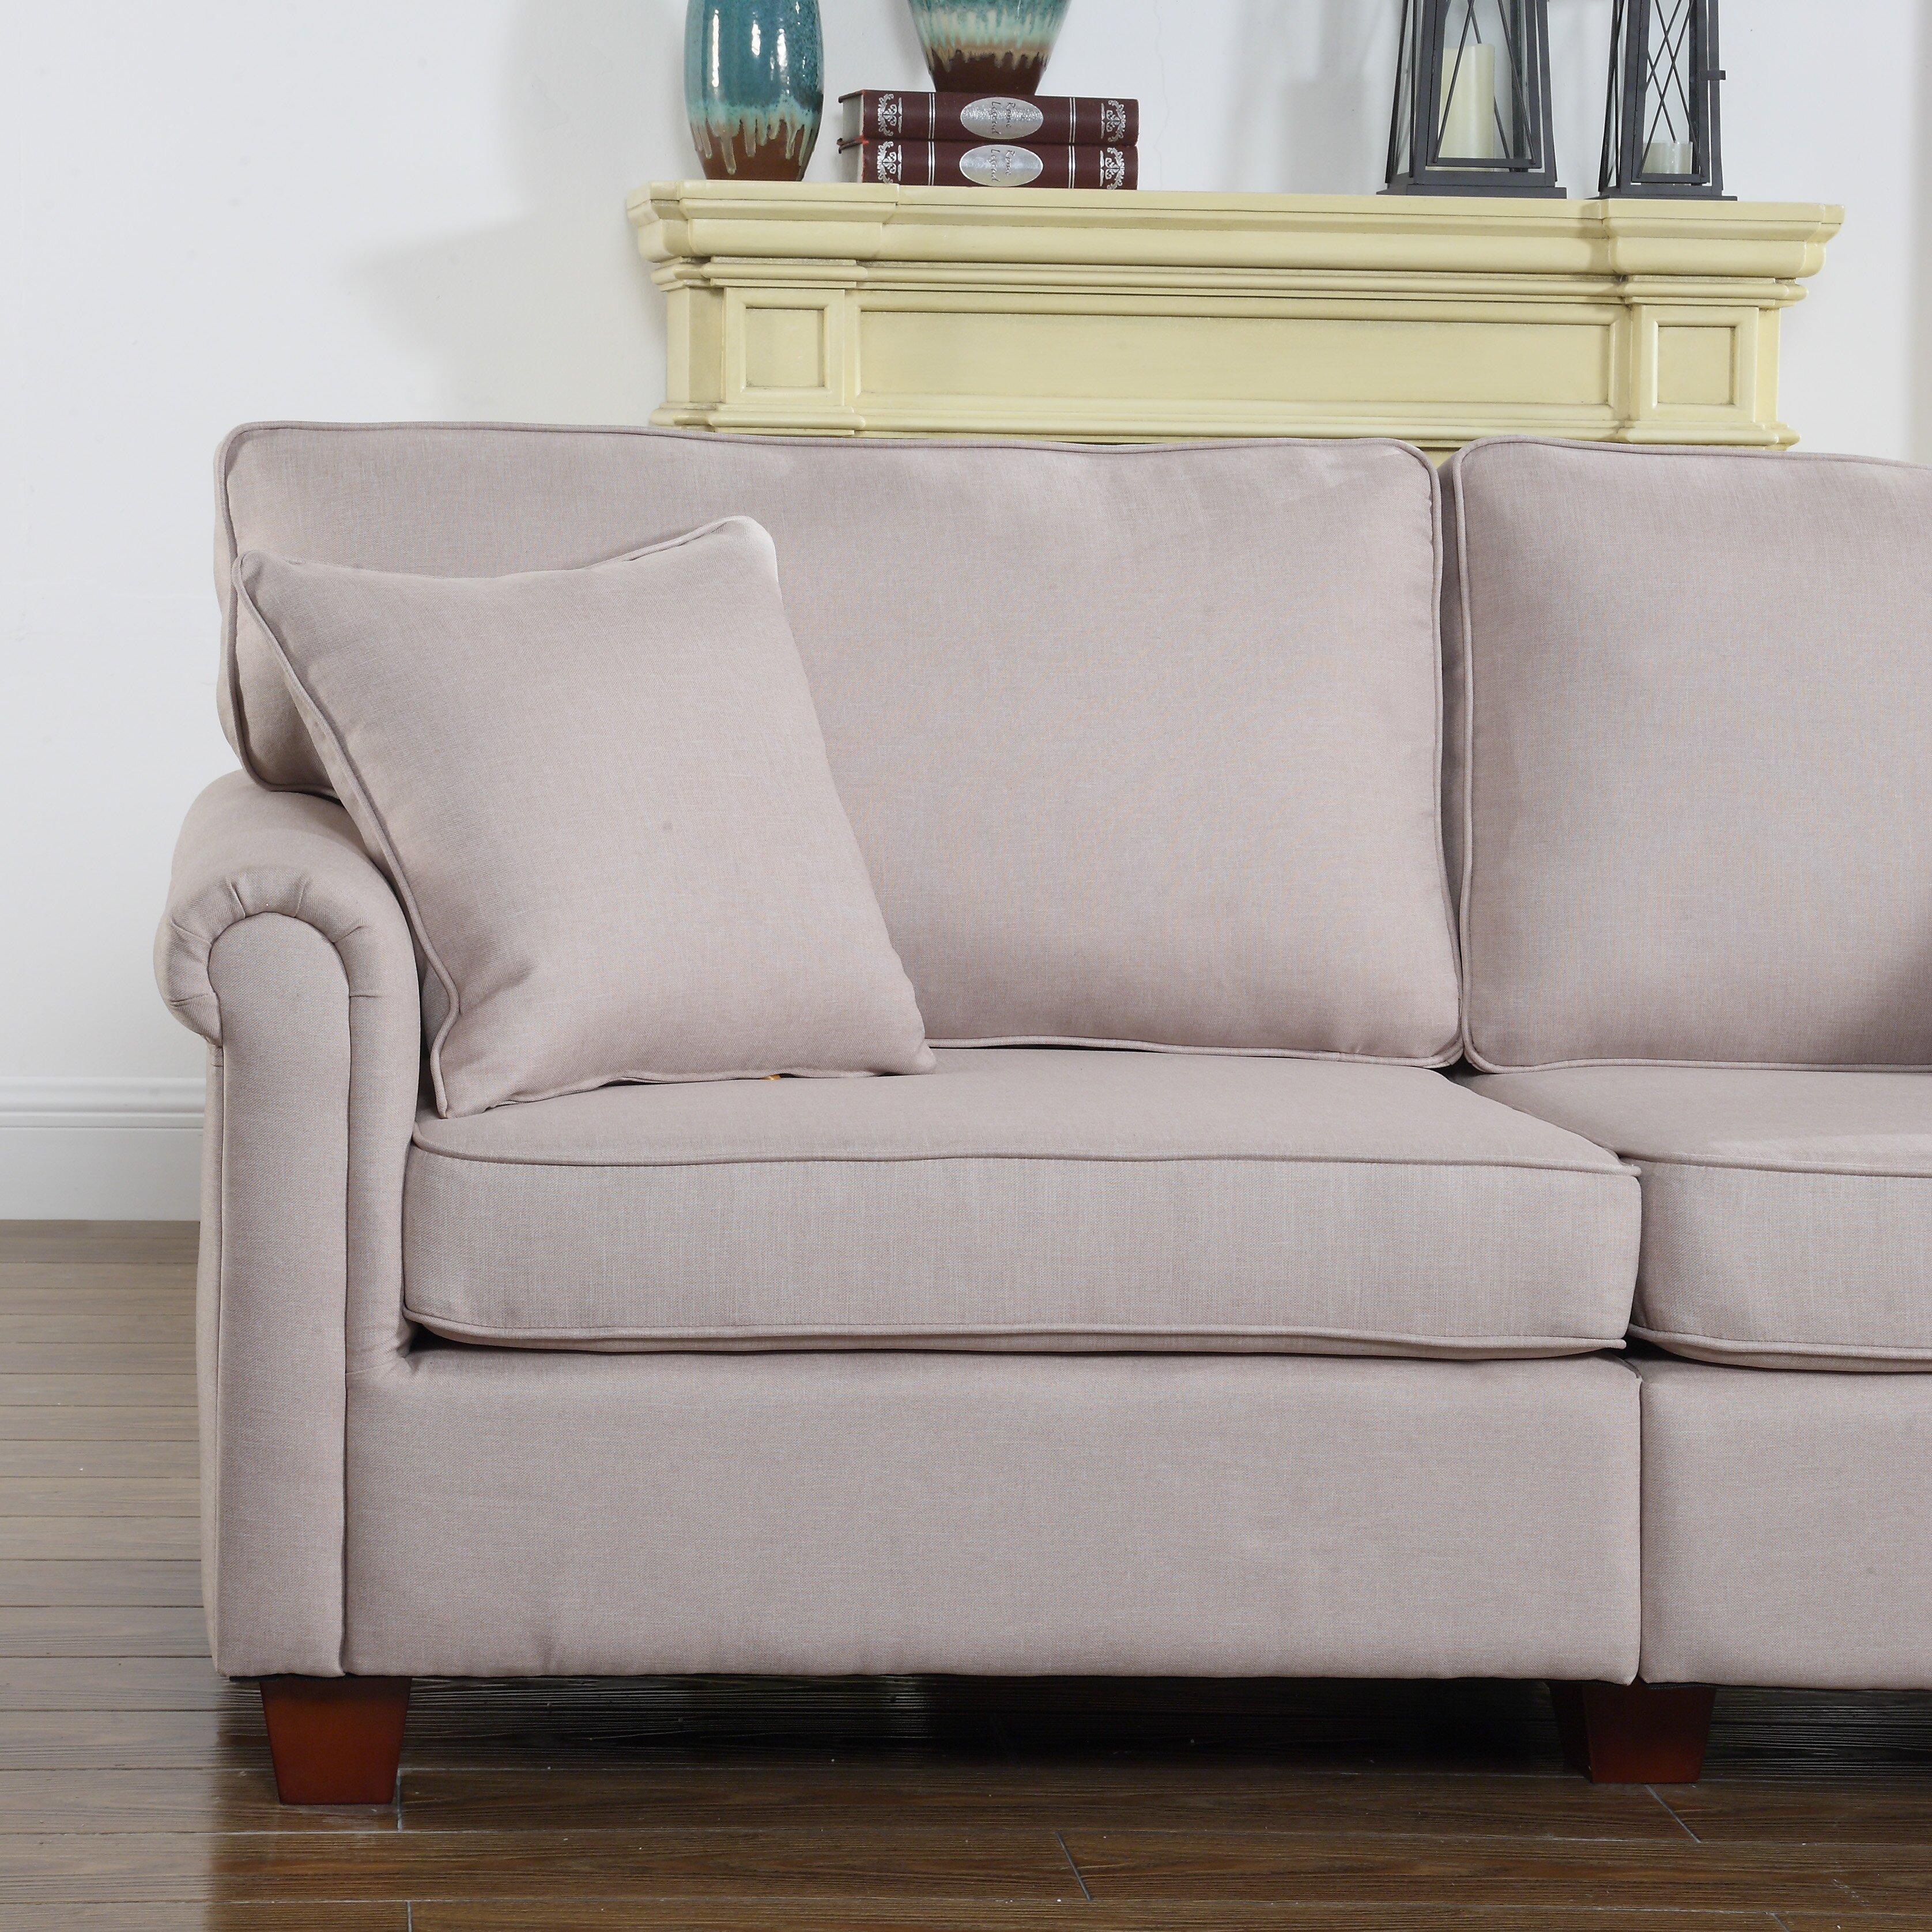 Madrid Taupe Beige Ultra Modern Living Room Furniture 3: Madison Home USA Classic Living Room Linen Fabric Sofa